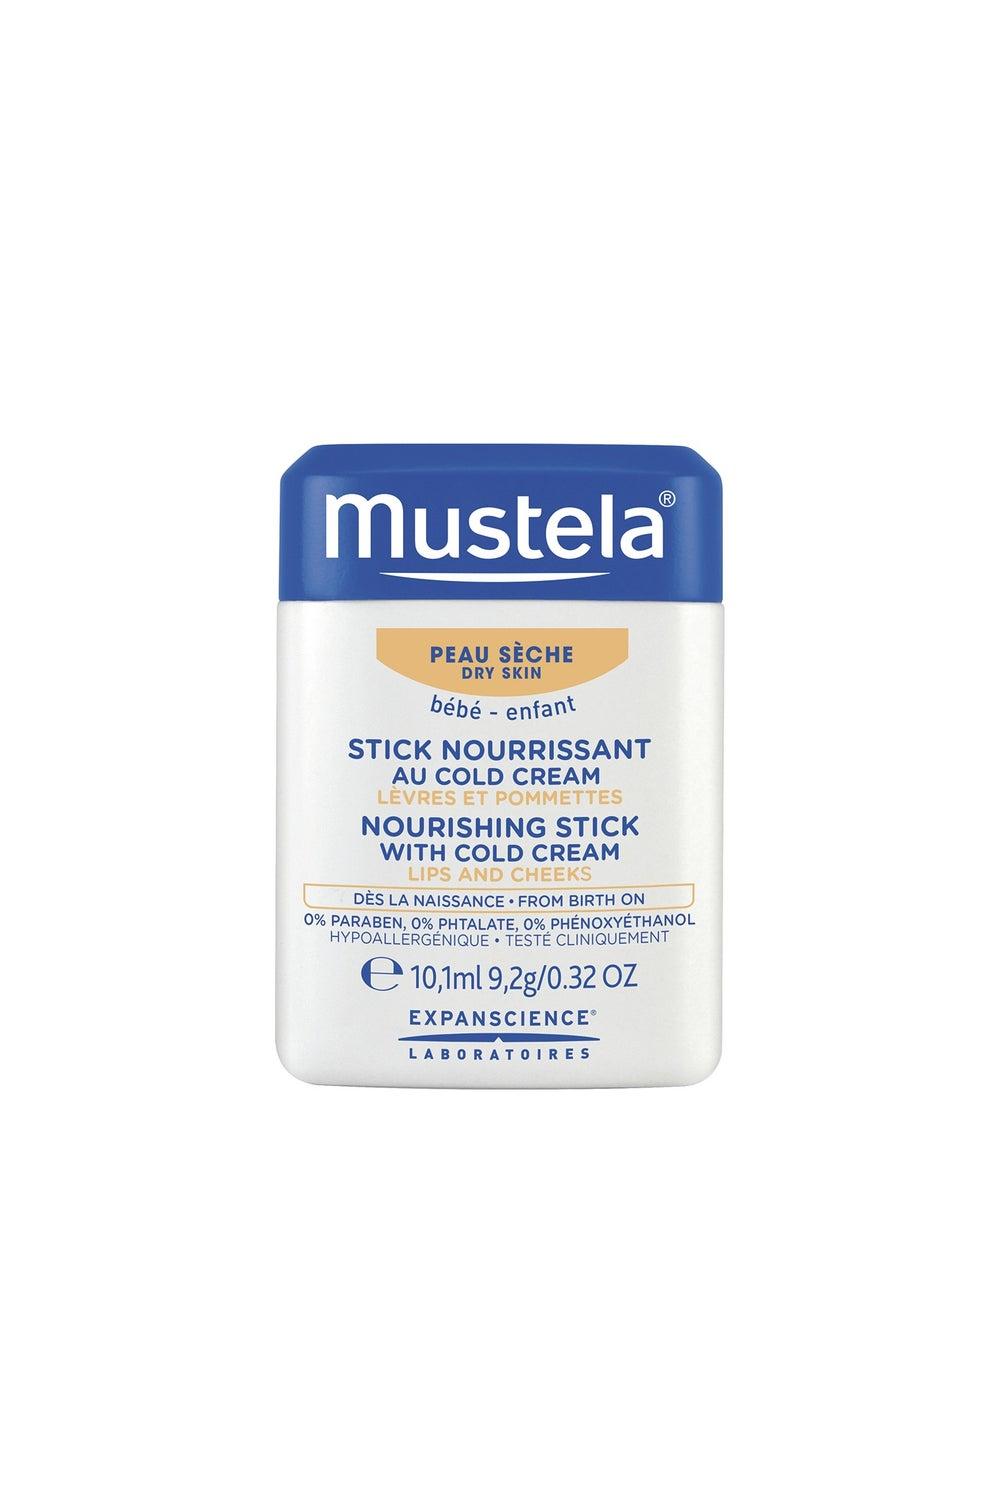 Mustela Nourishing Stick with Cold Cream 10ml 712050